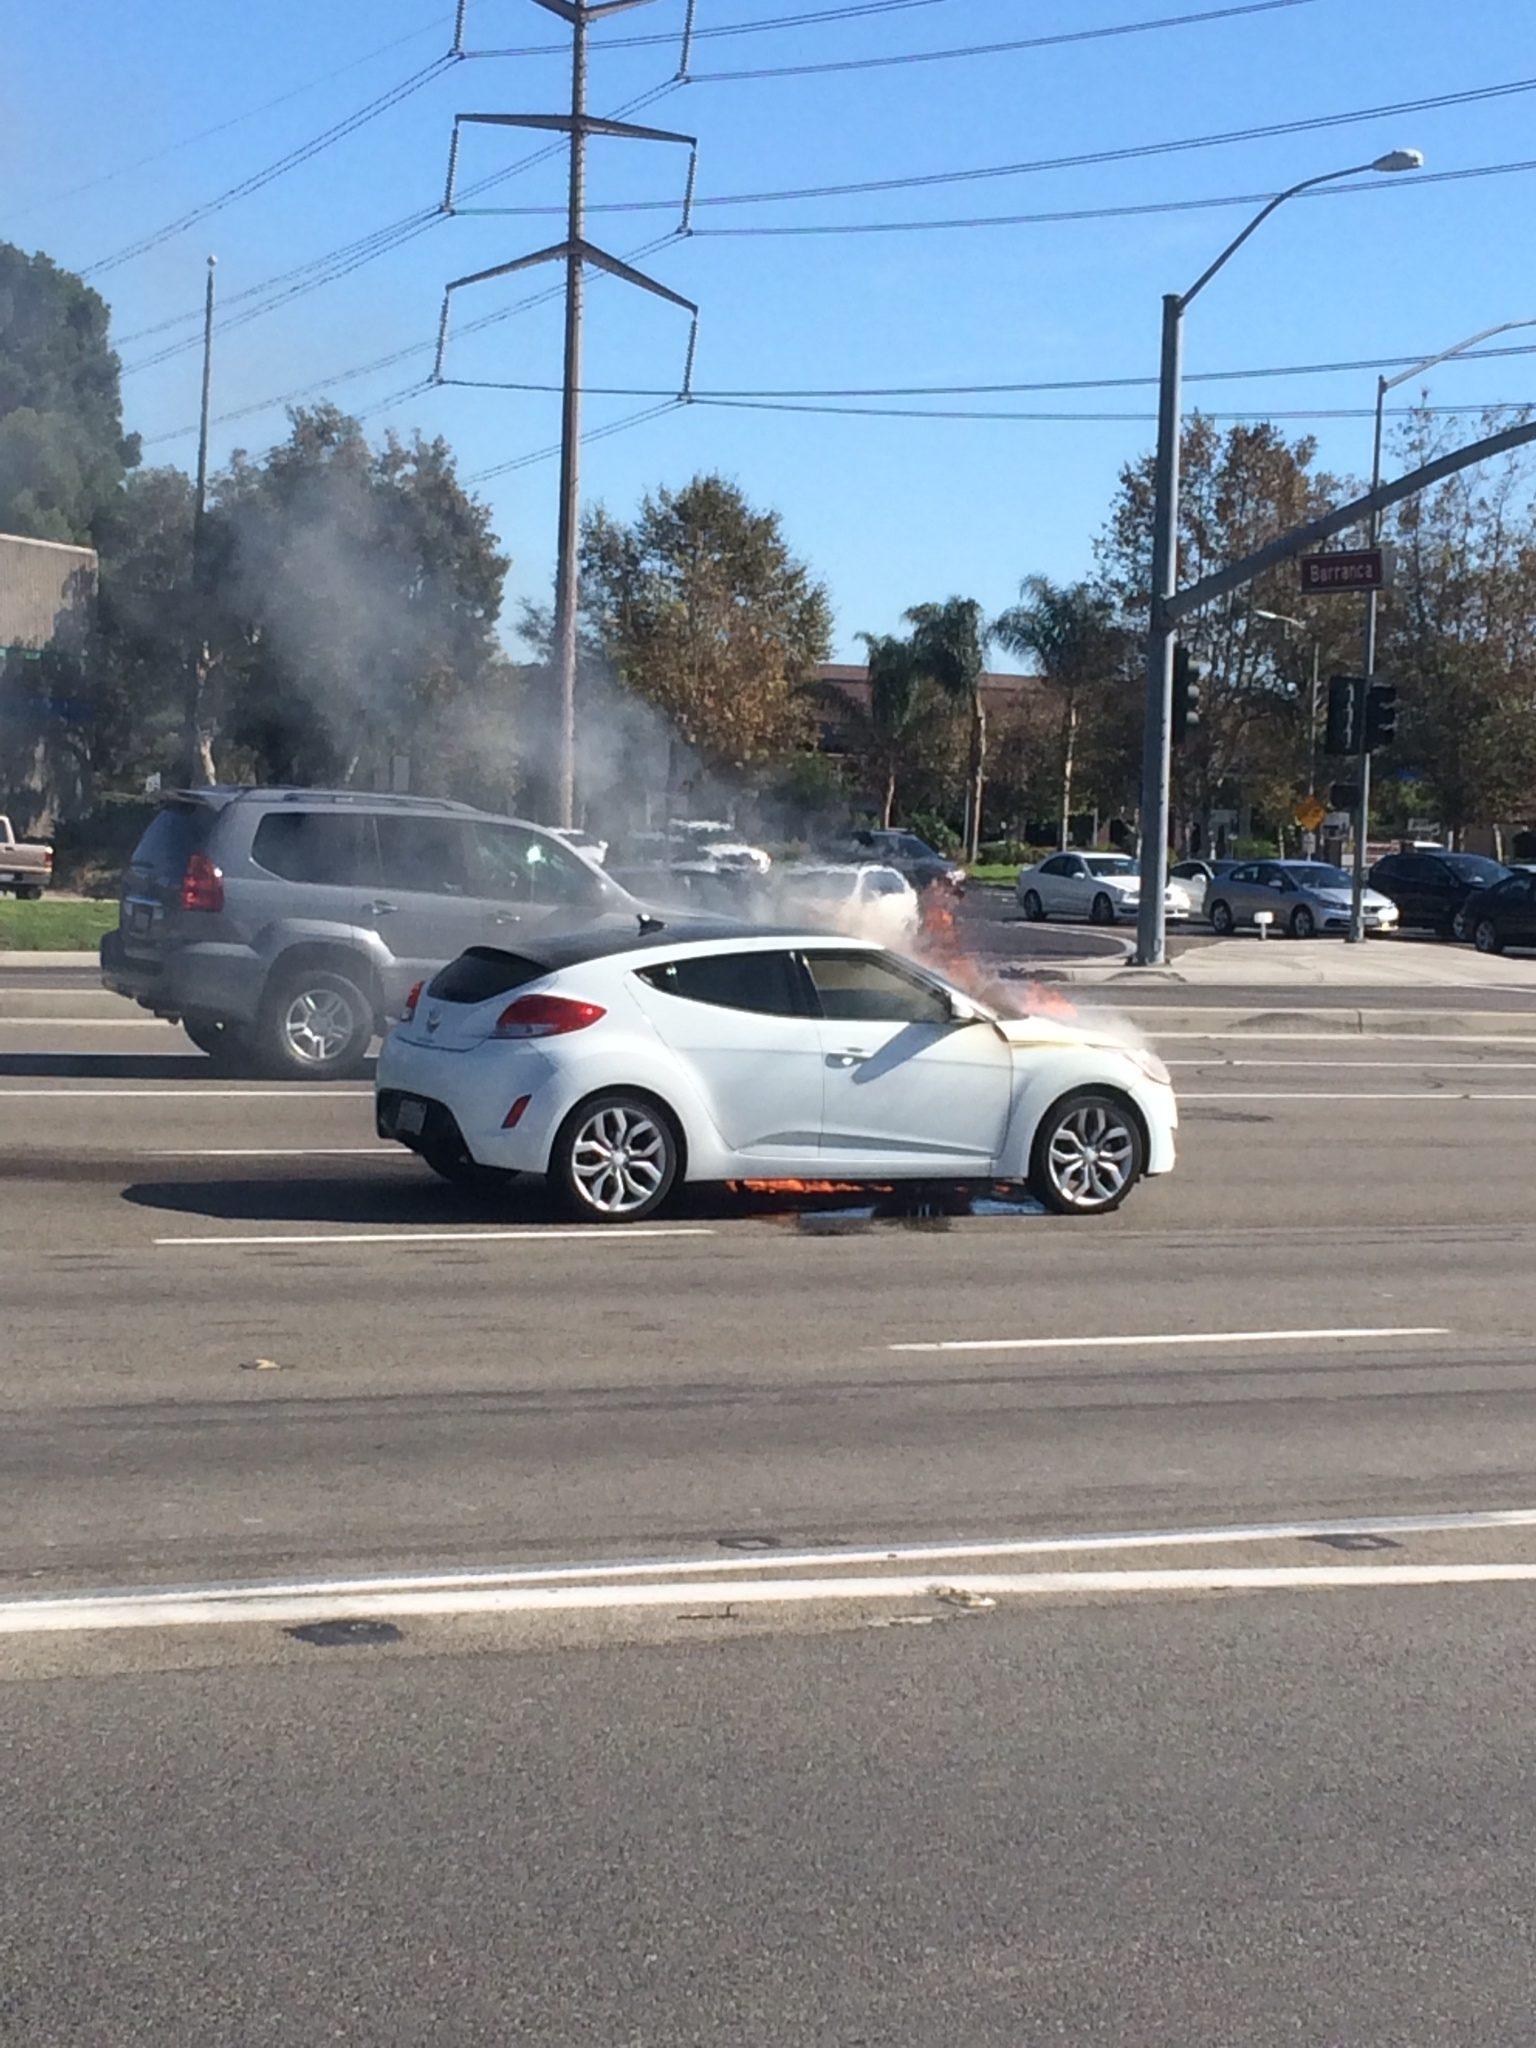 Did I get Ripped off on buying a used 2010 Hyundai Santa fe?